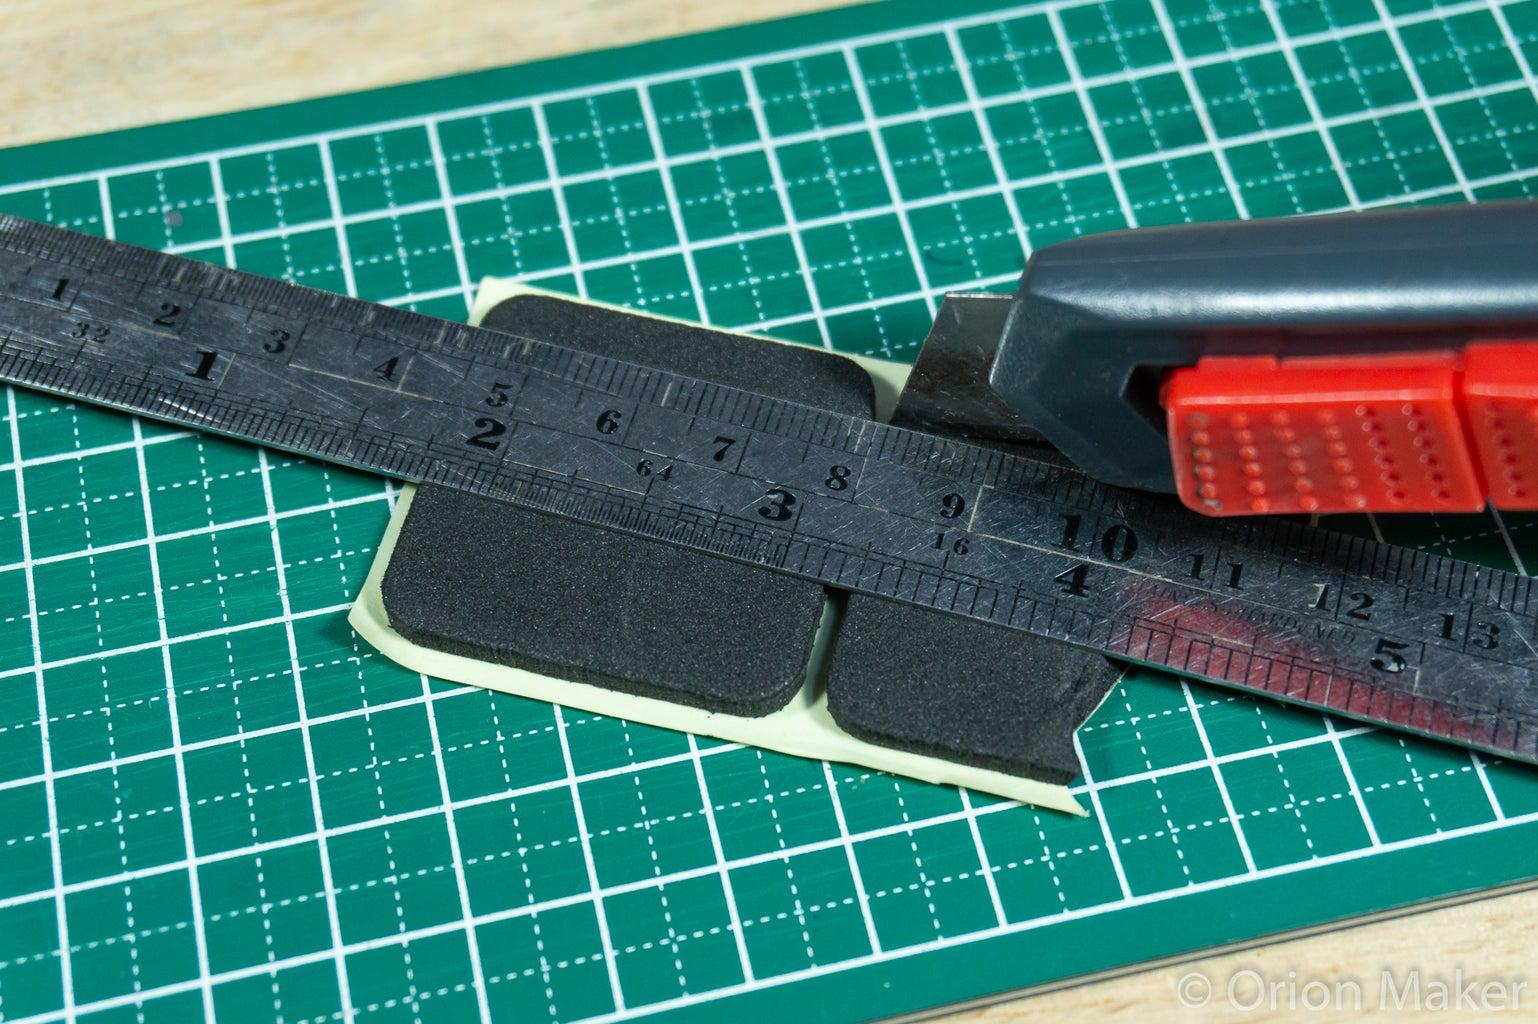 Make Monitor Stand Non-slip Pads